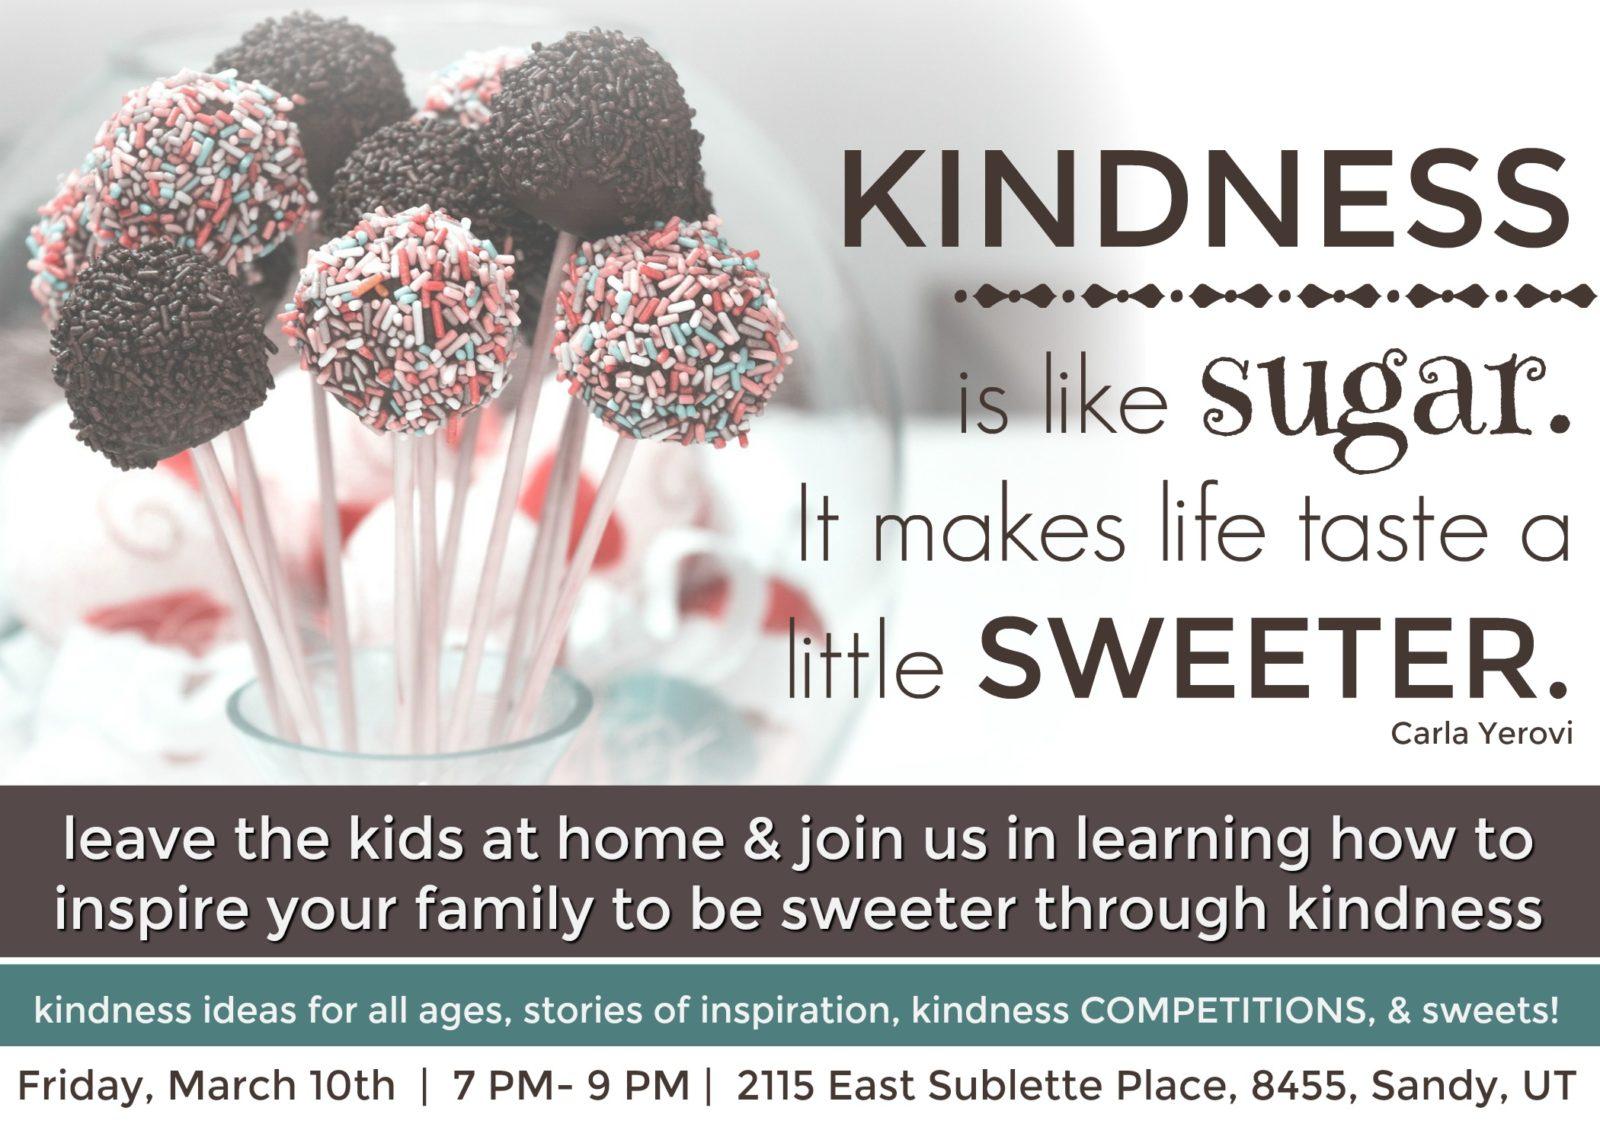 Kindness Make Life Sweeter\